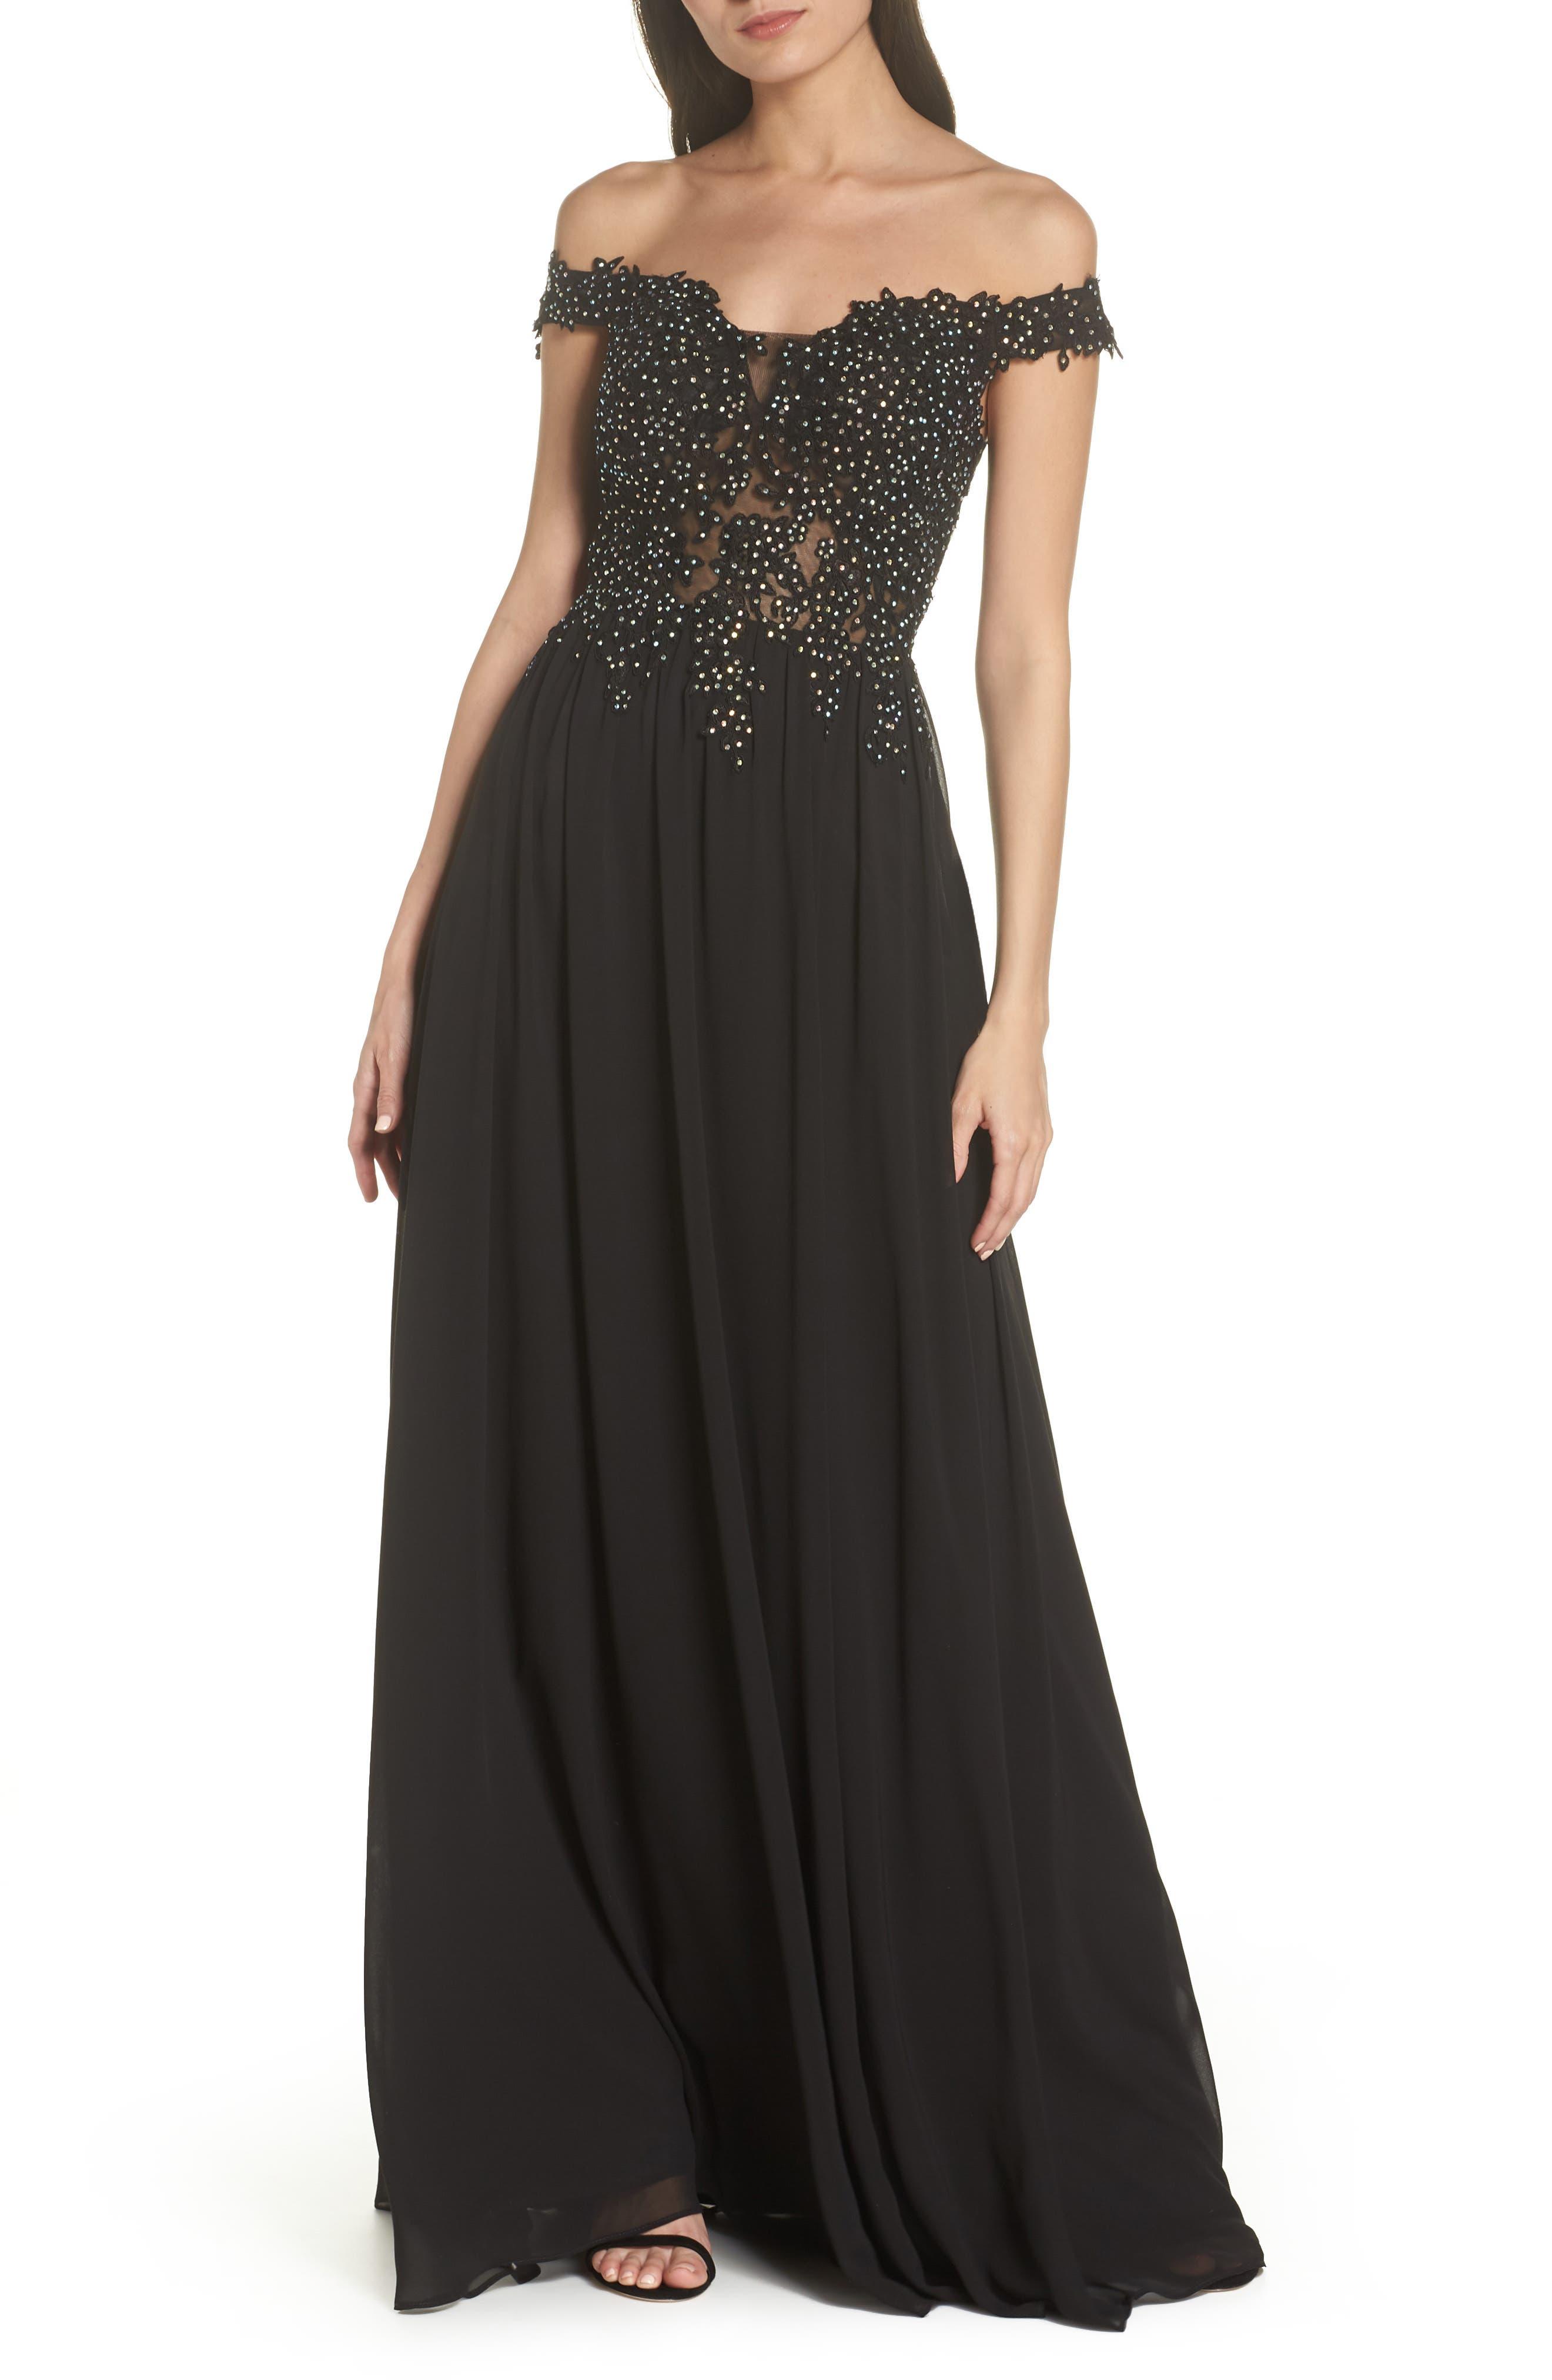 Blondie Nites Off The Shoulder Illusion Back Gown, Black